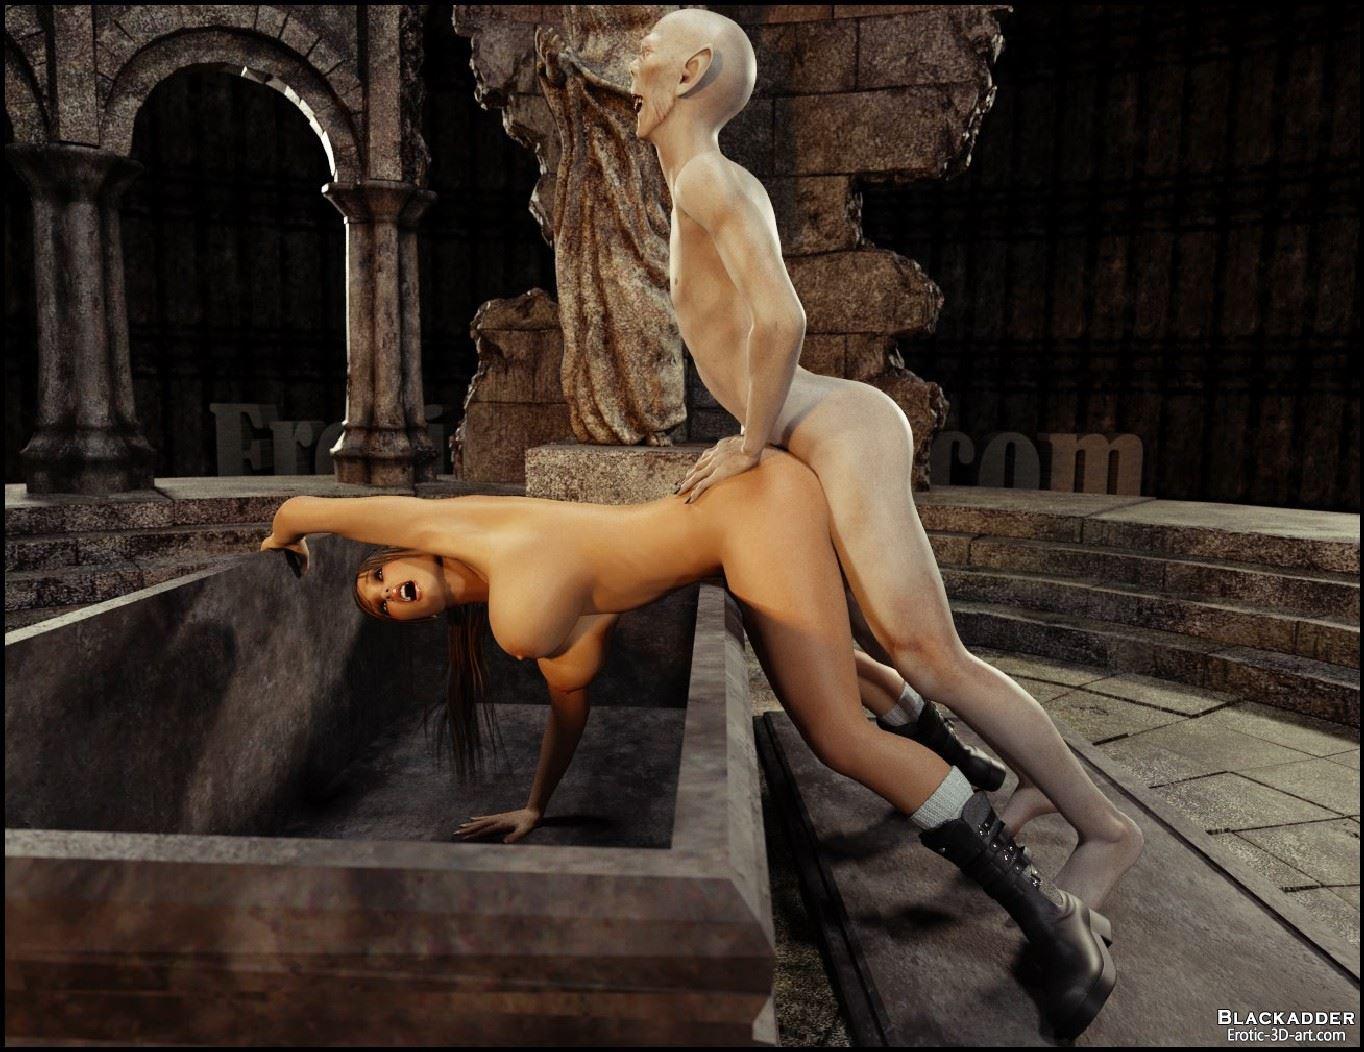 Lara crote captive fuck animated sexy galleries